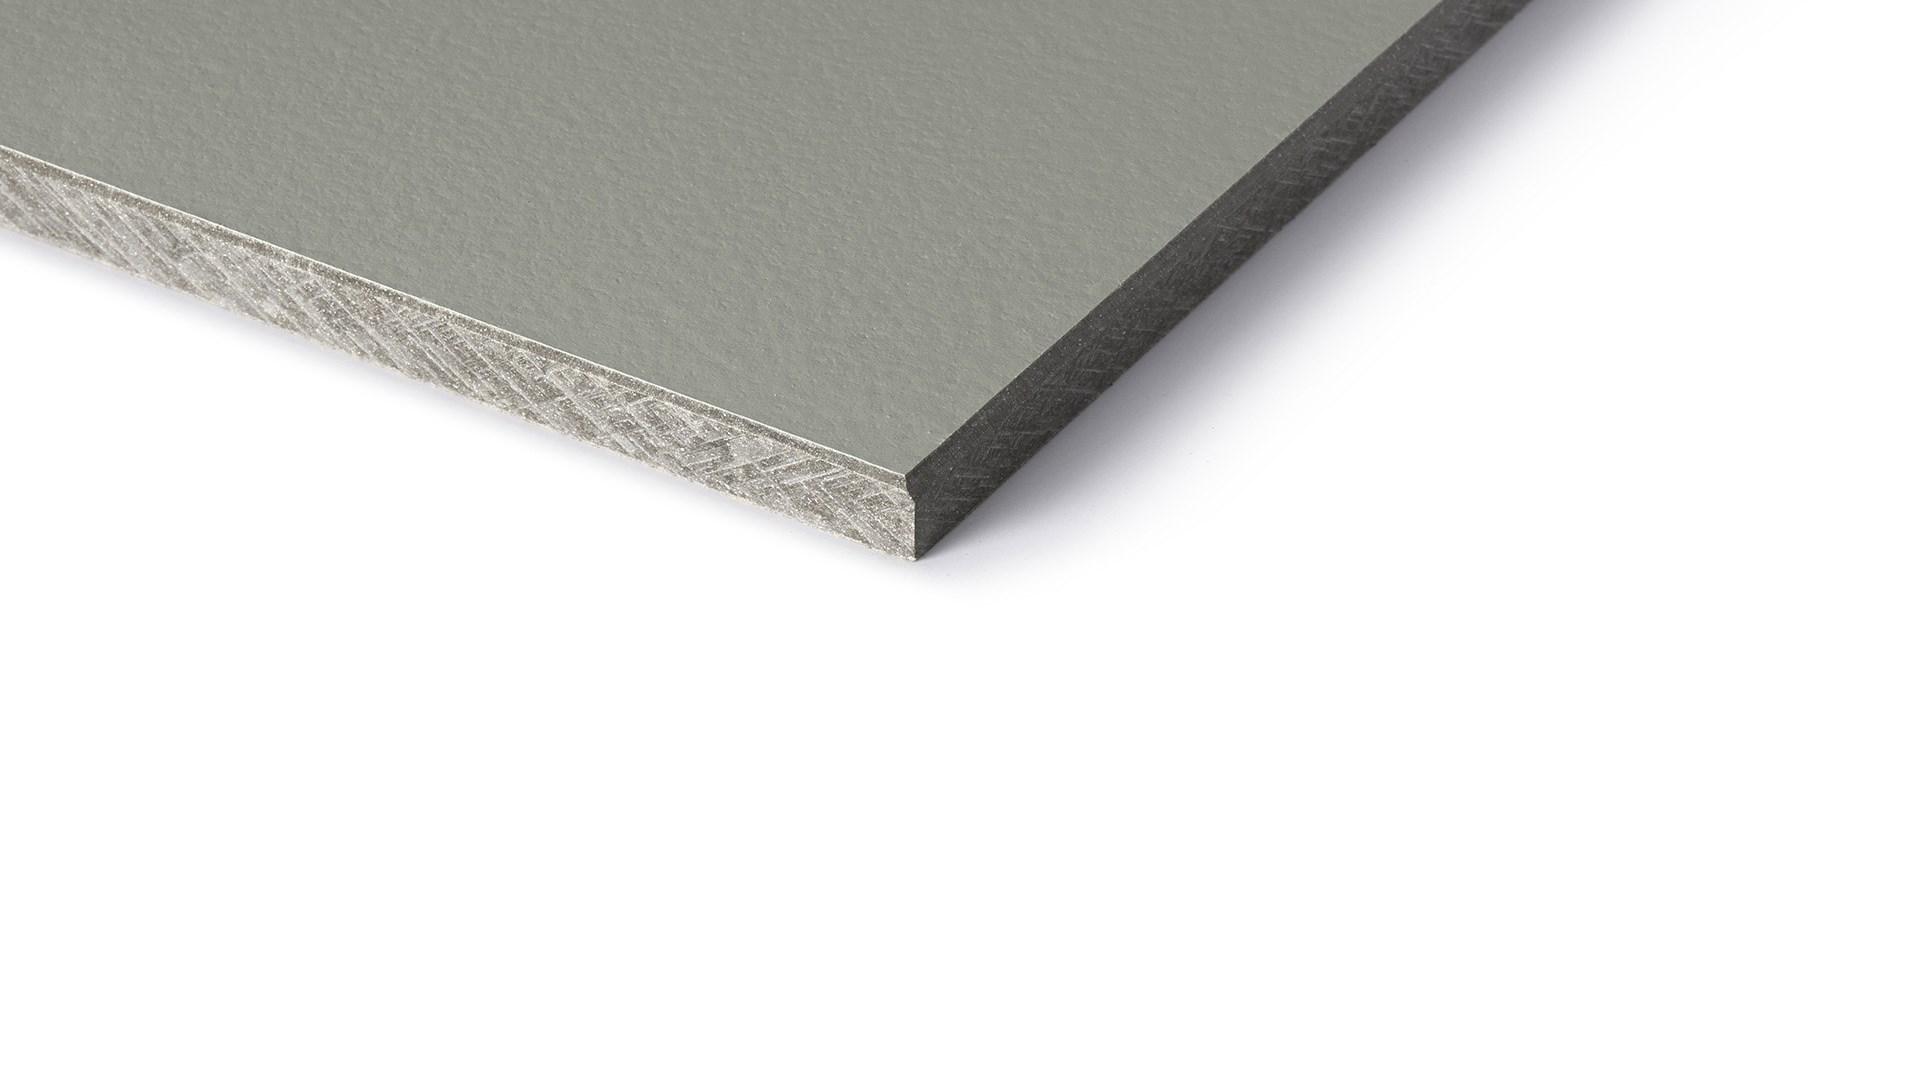 cembrit-cover-600-kolor-plyta-elewacyjna-wzornik